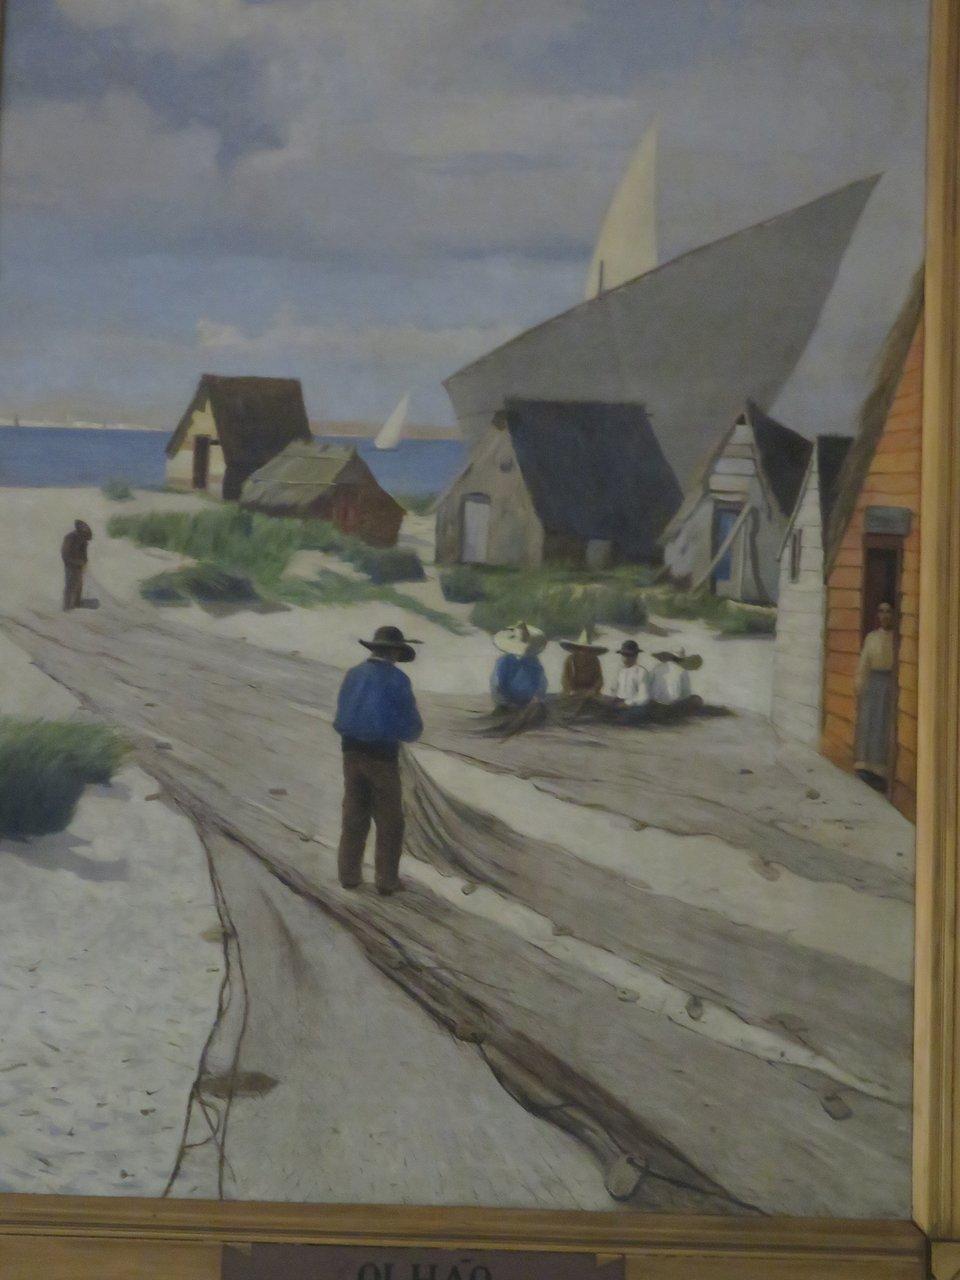 The Little Shop Peinture museu de marinha, lisbon - tripadvisor